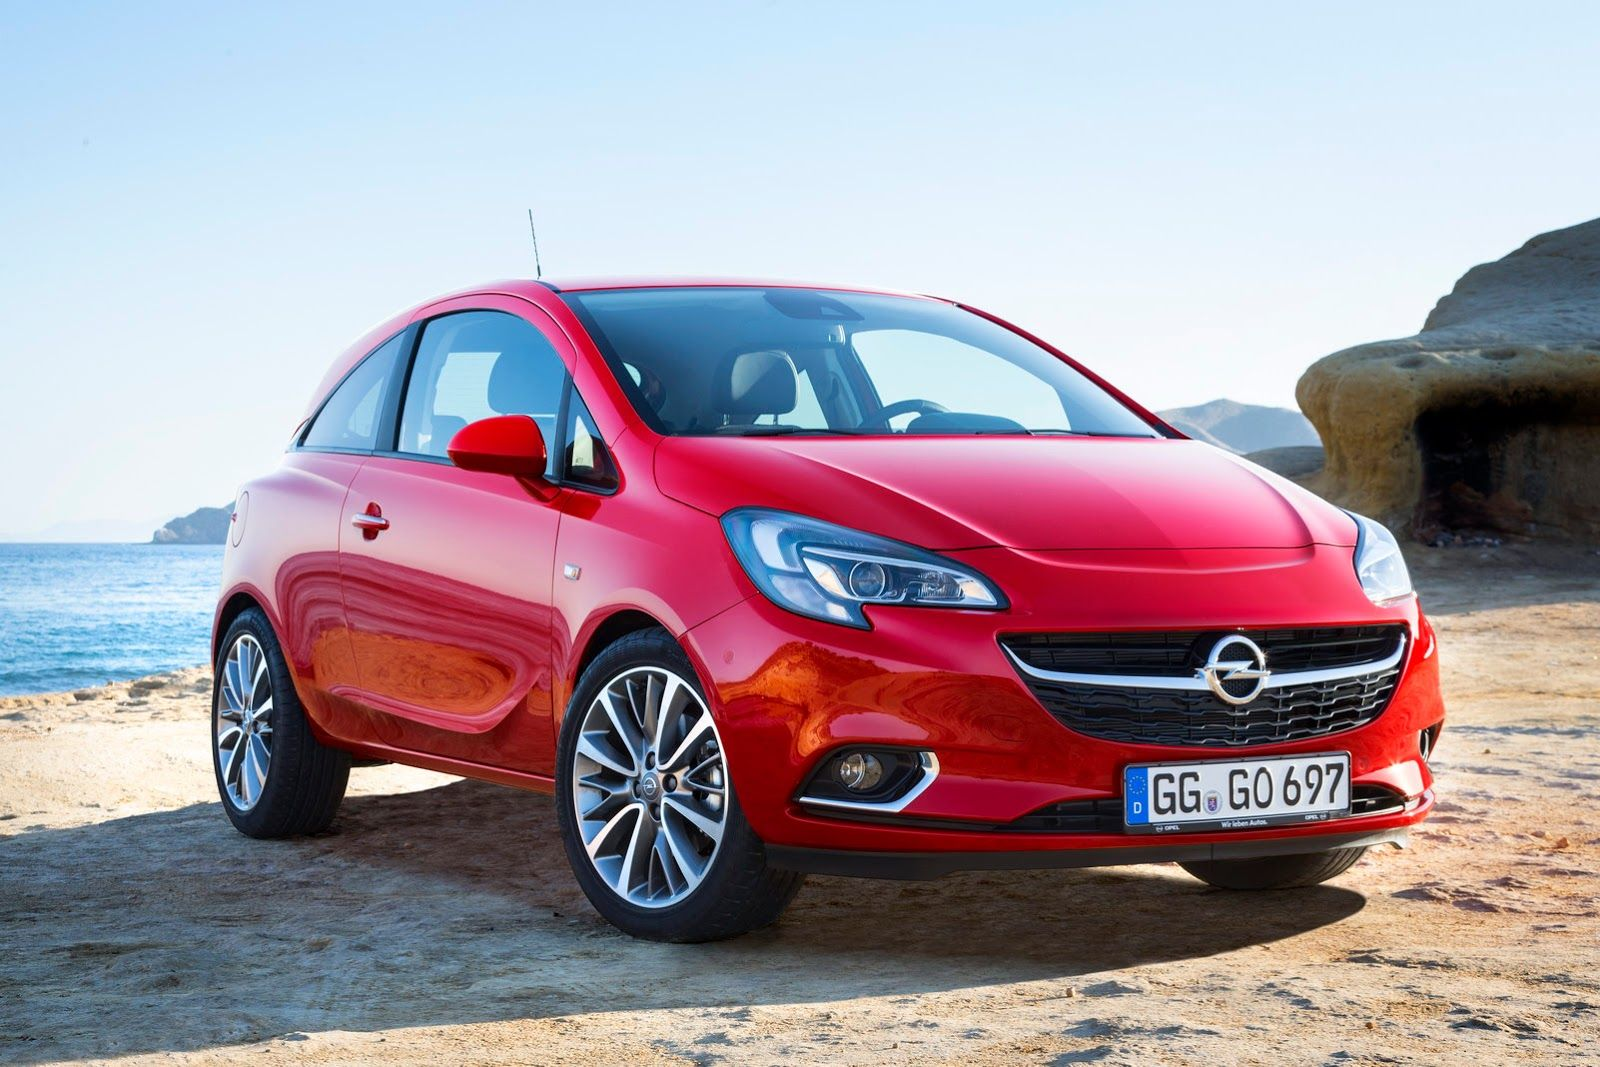 New Vauxhall Corsa 3 Door Preview Hd Wallpapers Http Wallsauto